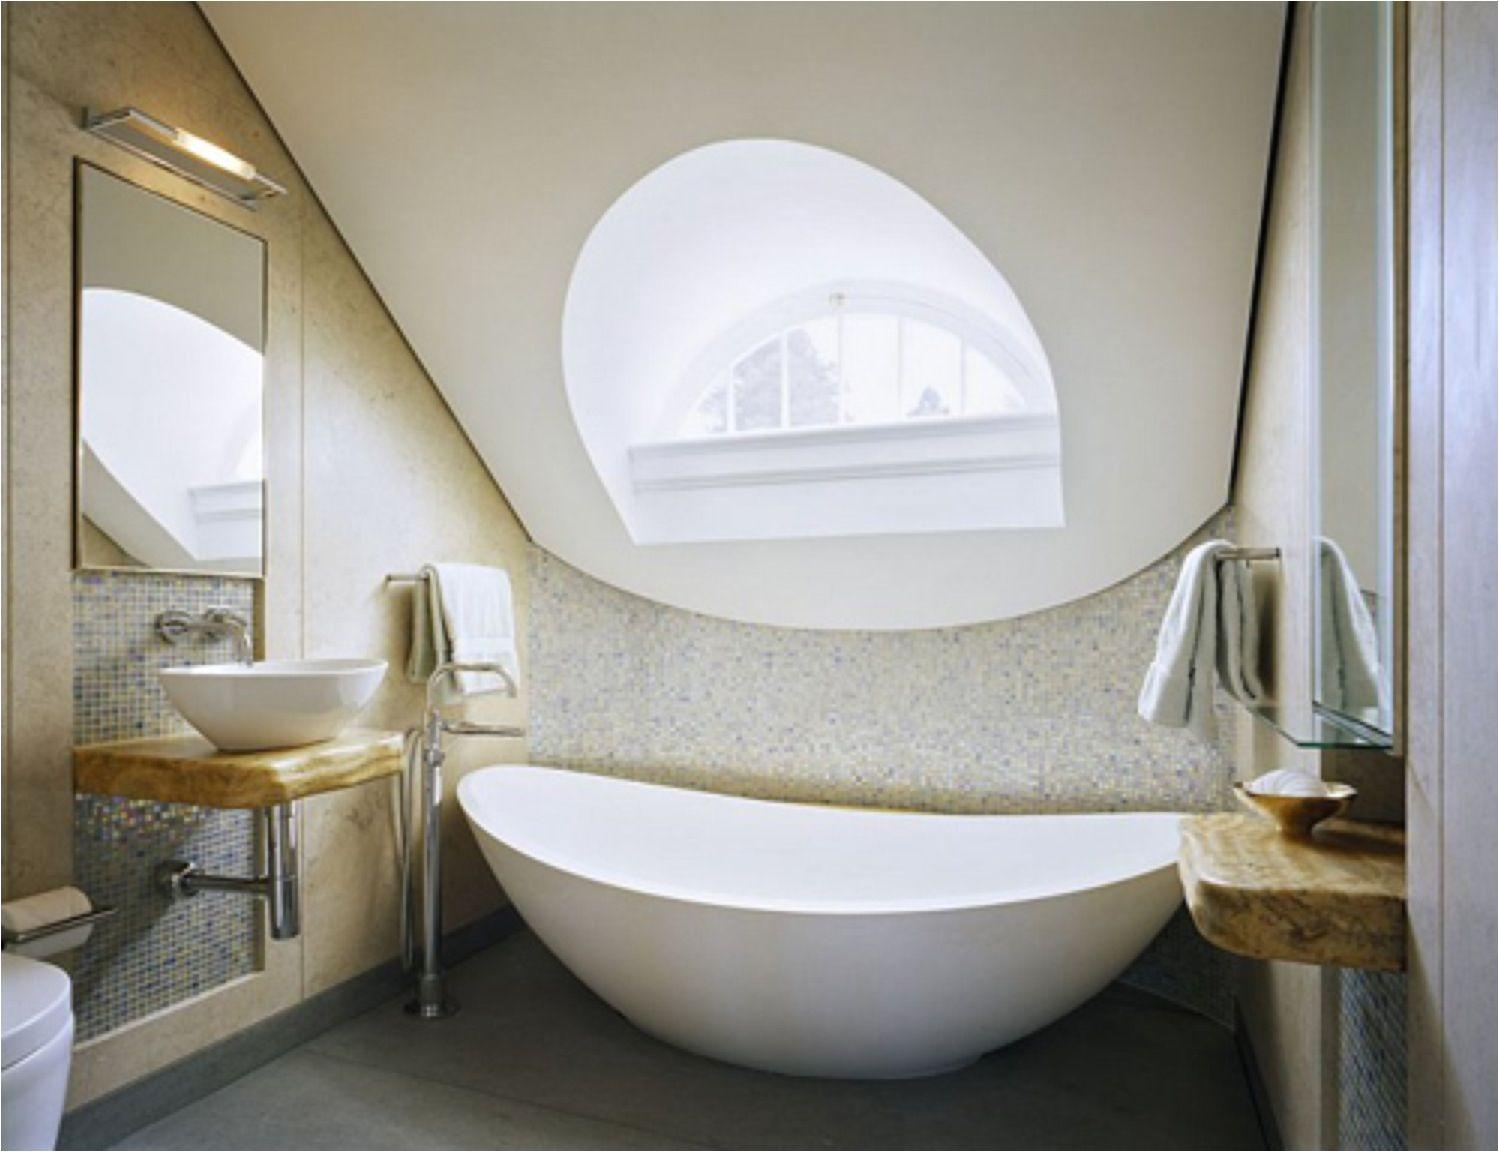 Modern Attic Bathroom with Roof light